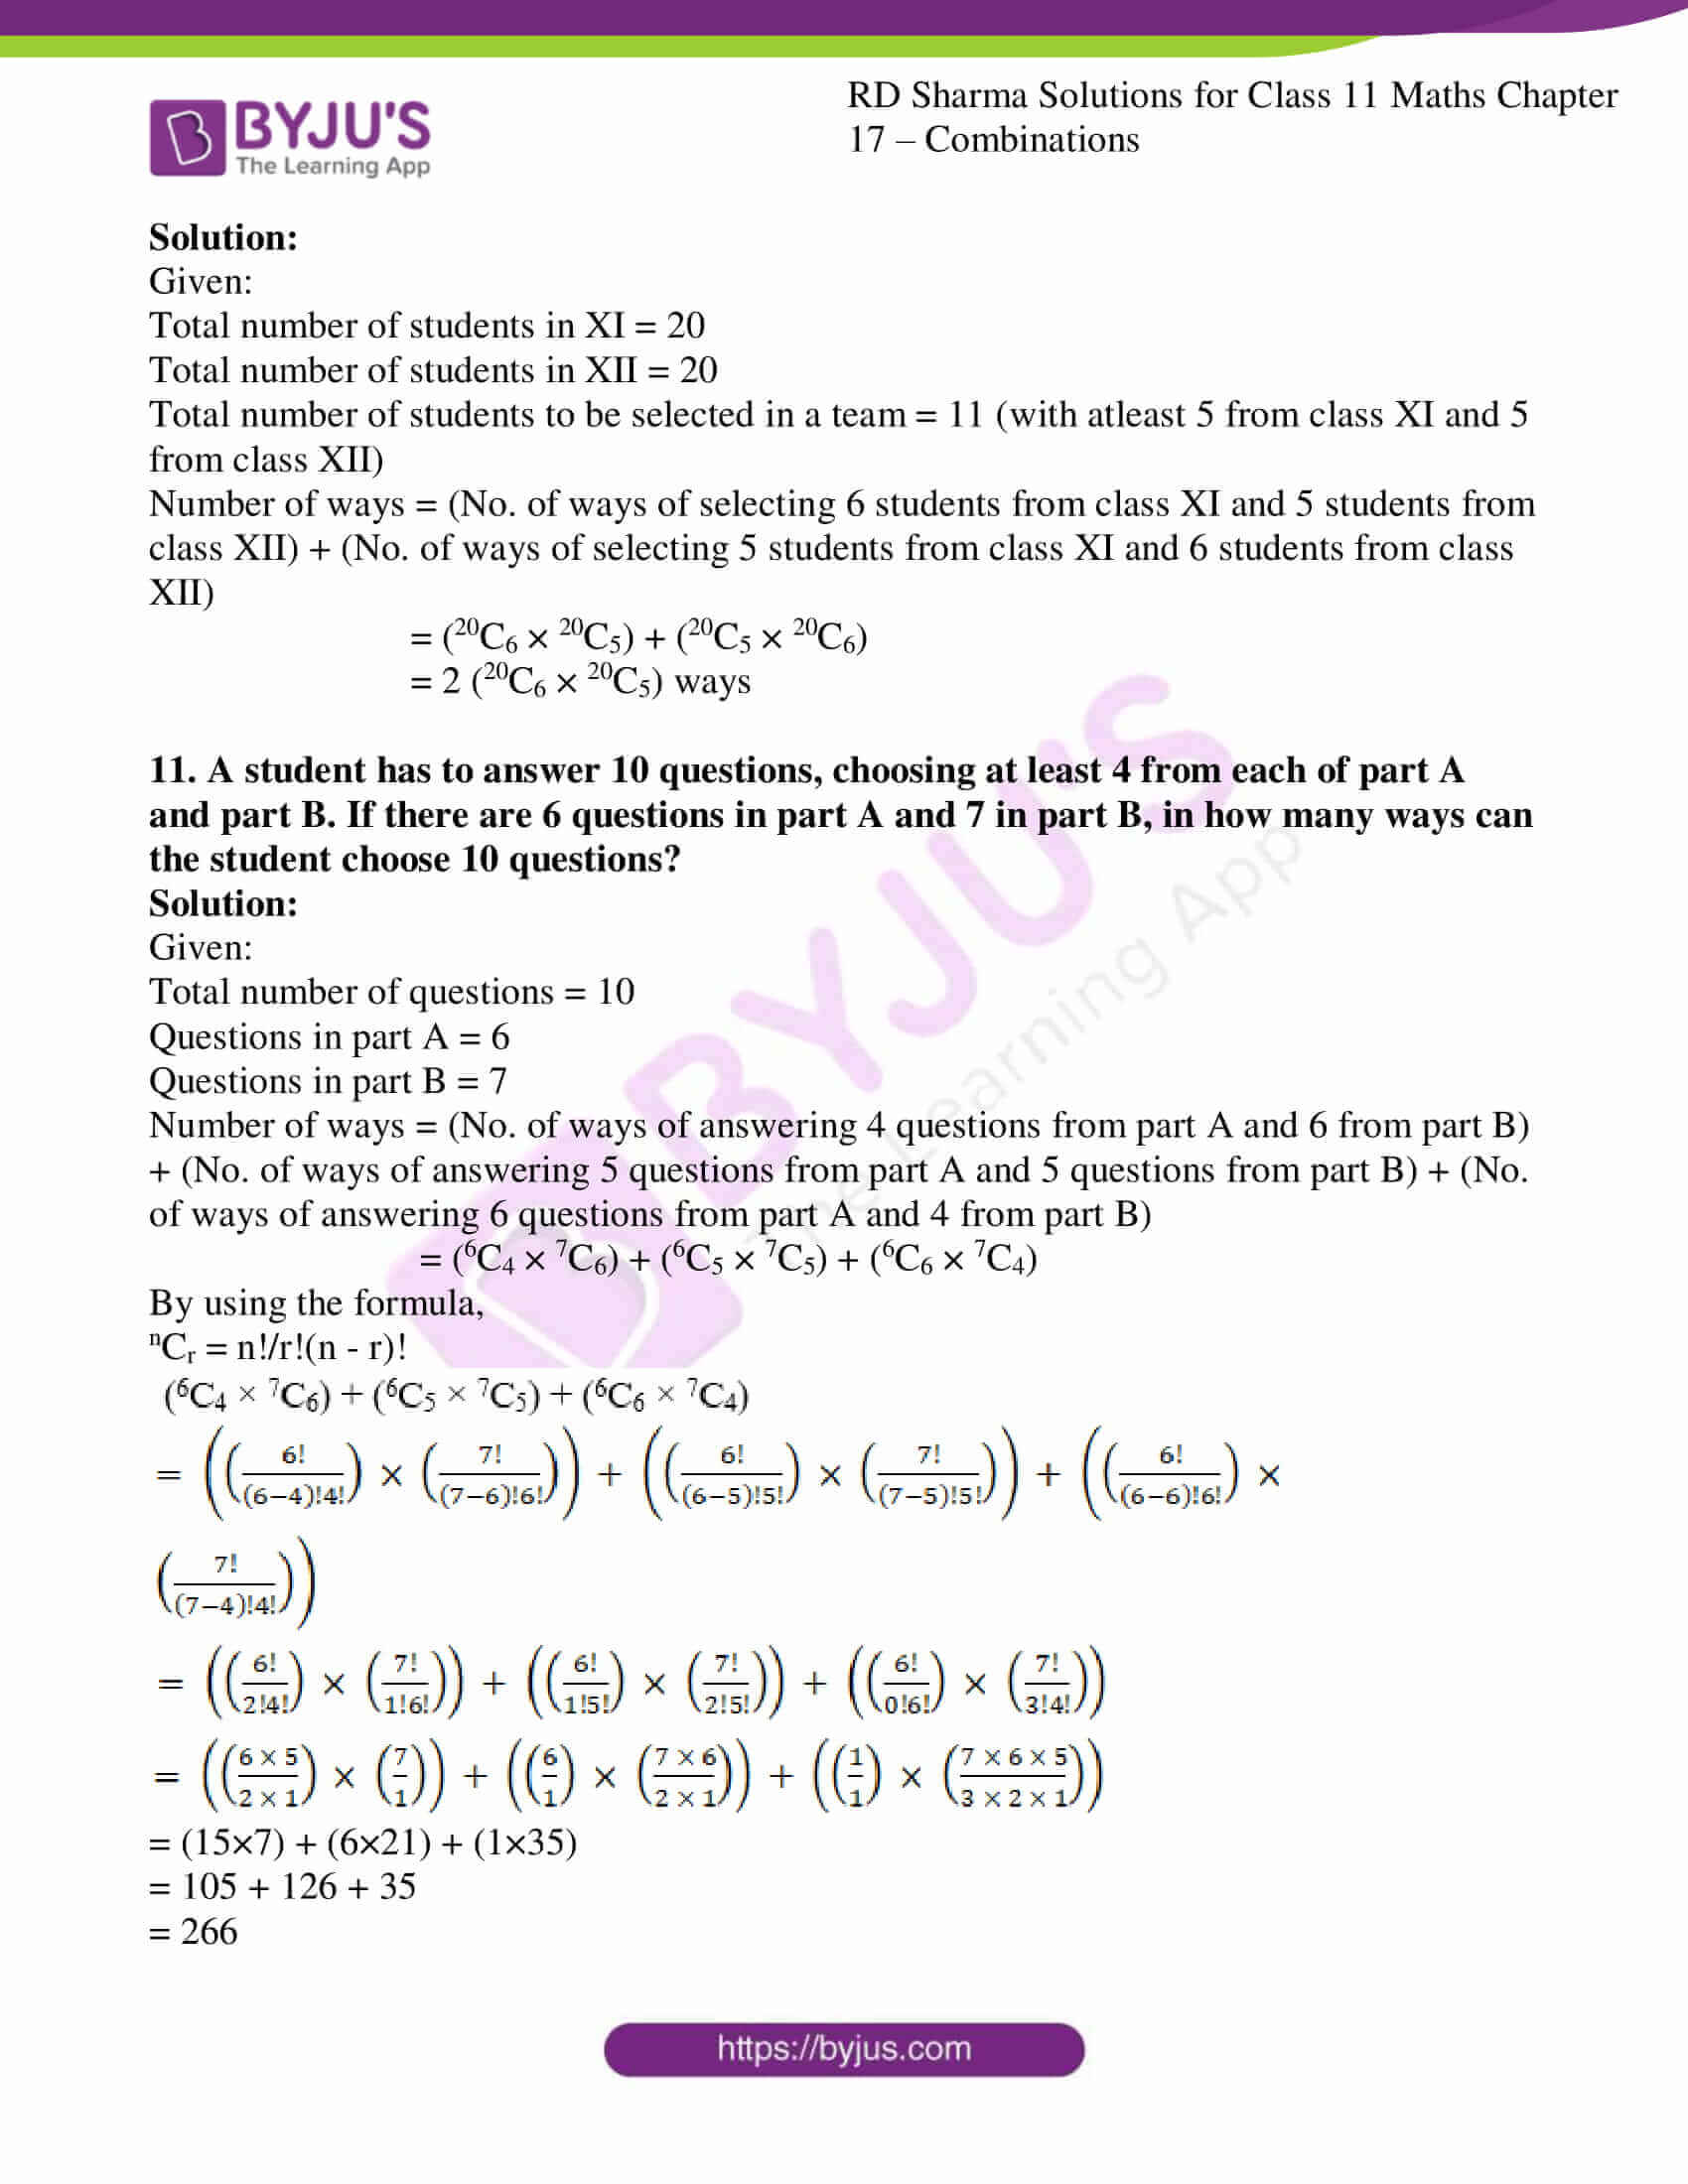 rd sharma class 11 maths ch 17 ex 2 09